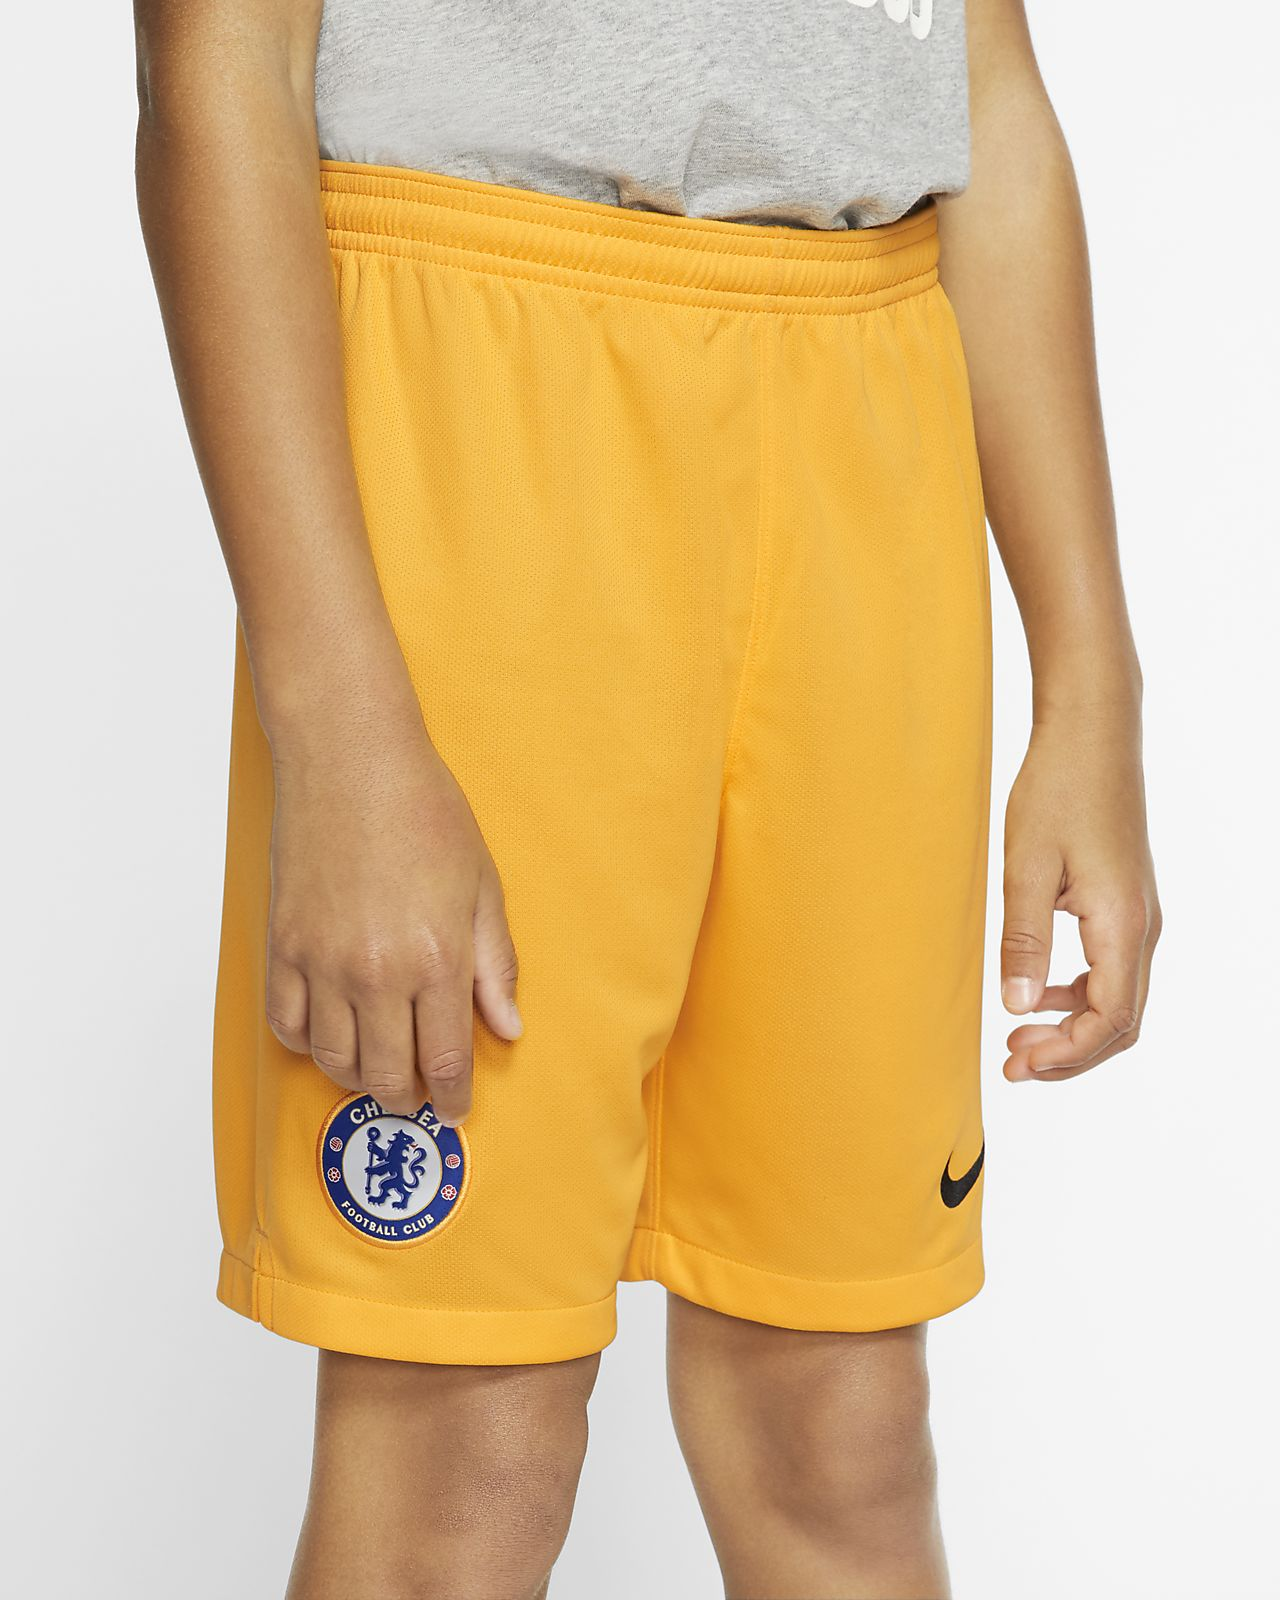 Chelsea FC 2019/20 Stadium Goalkeeper Pantalons curts de futbol - Nen/a